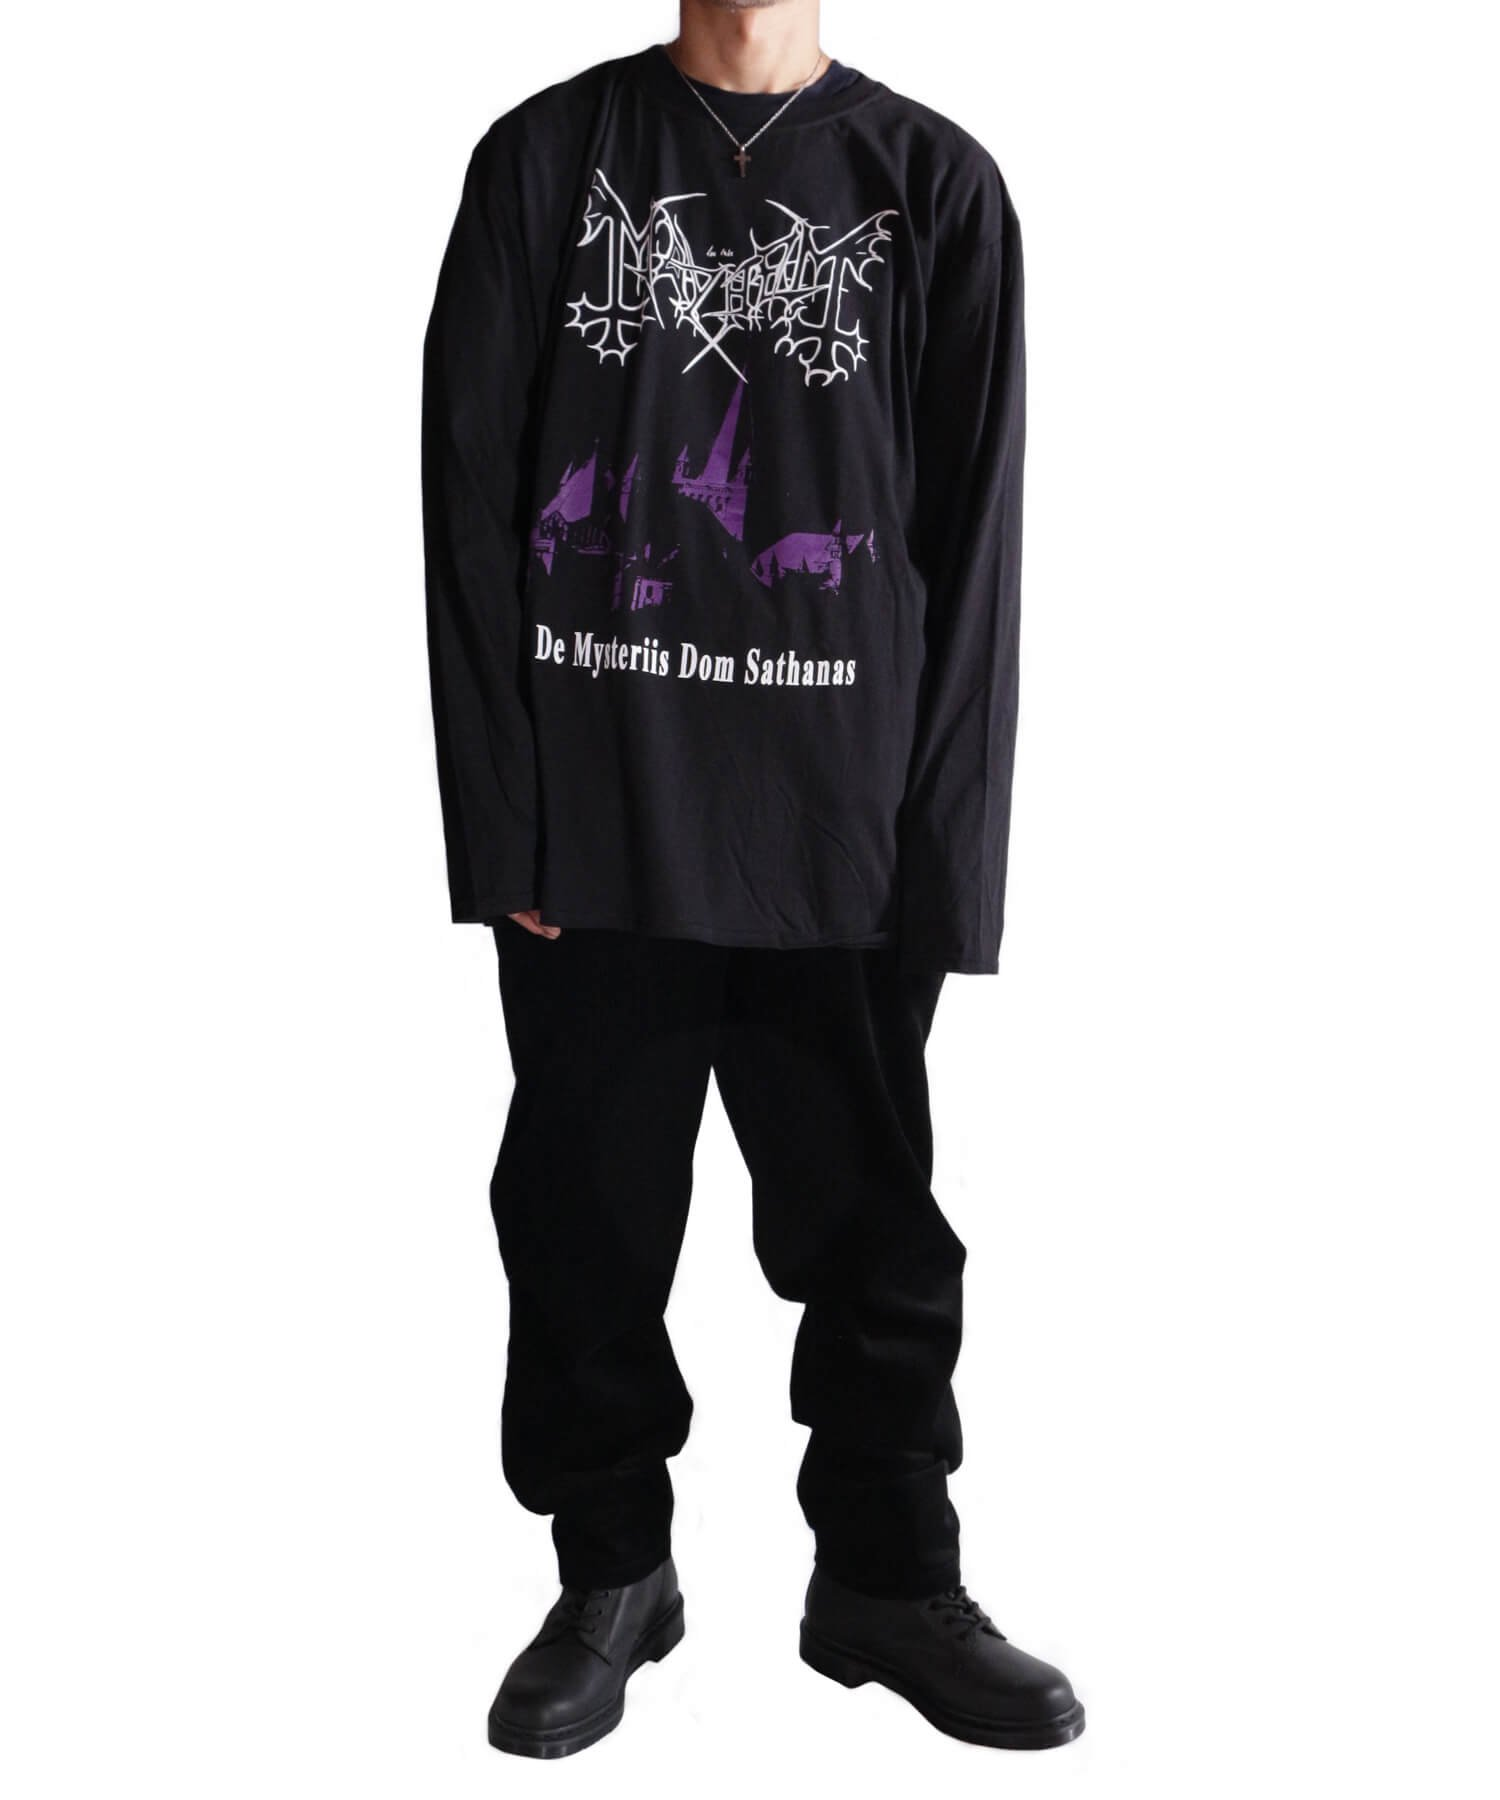 Official Artist Goods / バンドTなど |MAYHEM / メイヘム:DE MYSTERIIS DOM SATHANAS LONG SLEEVE SHIRT (BLACK) 商品画像11